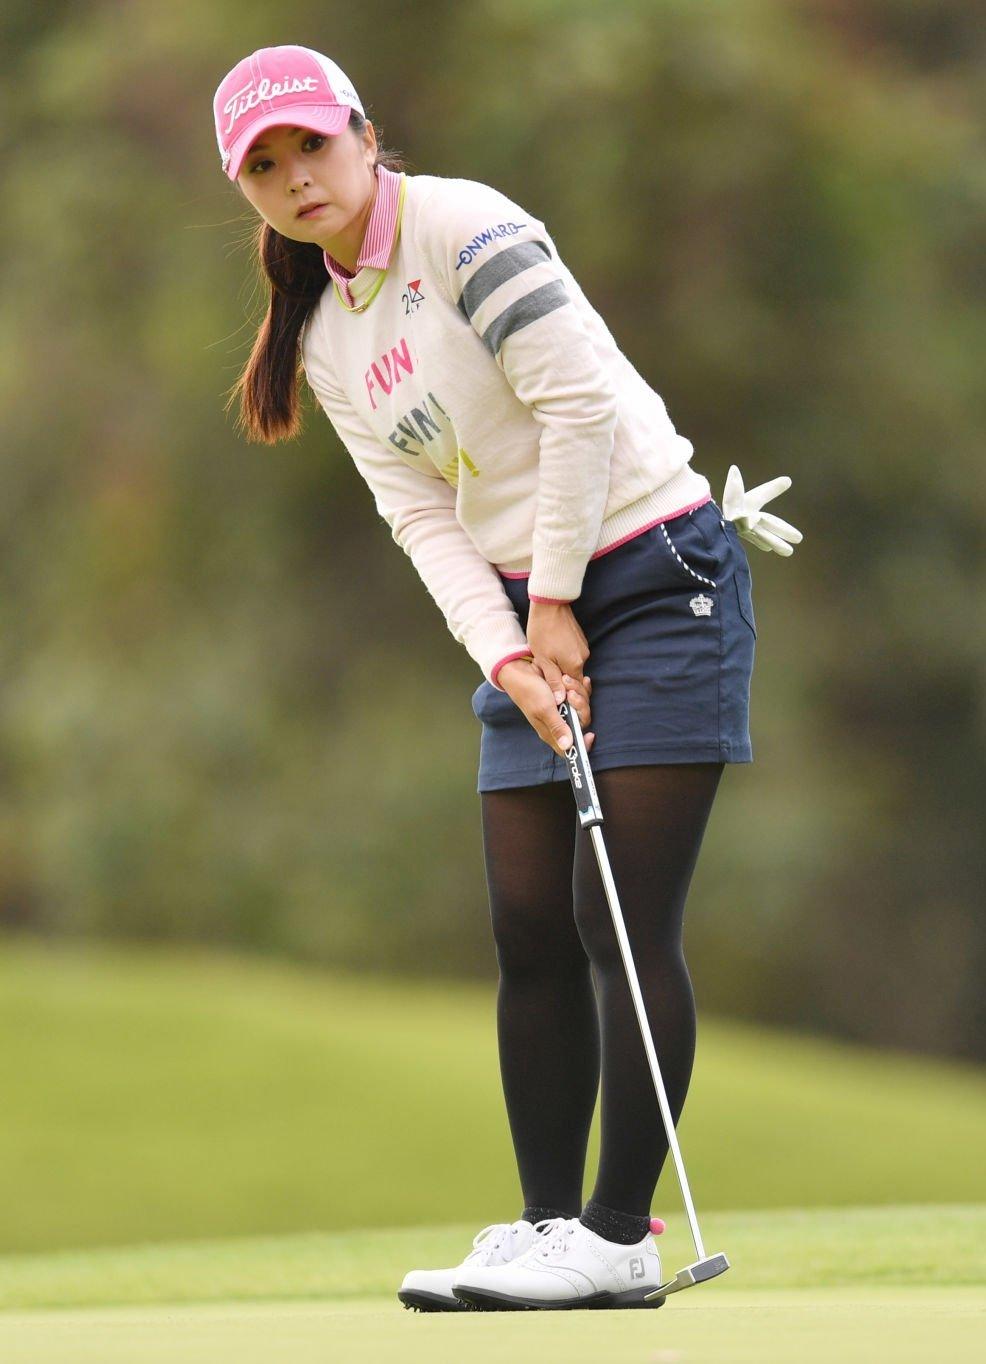 LPGA Tights | Women golfers, Chuck taylor sneakers, Great